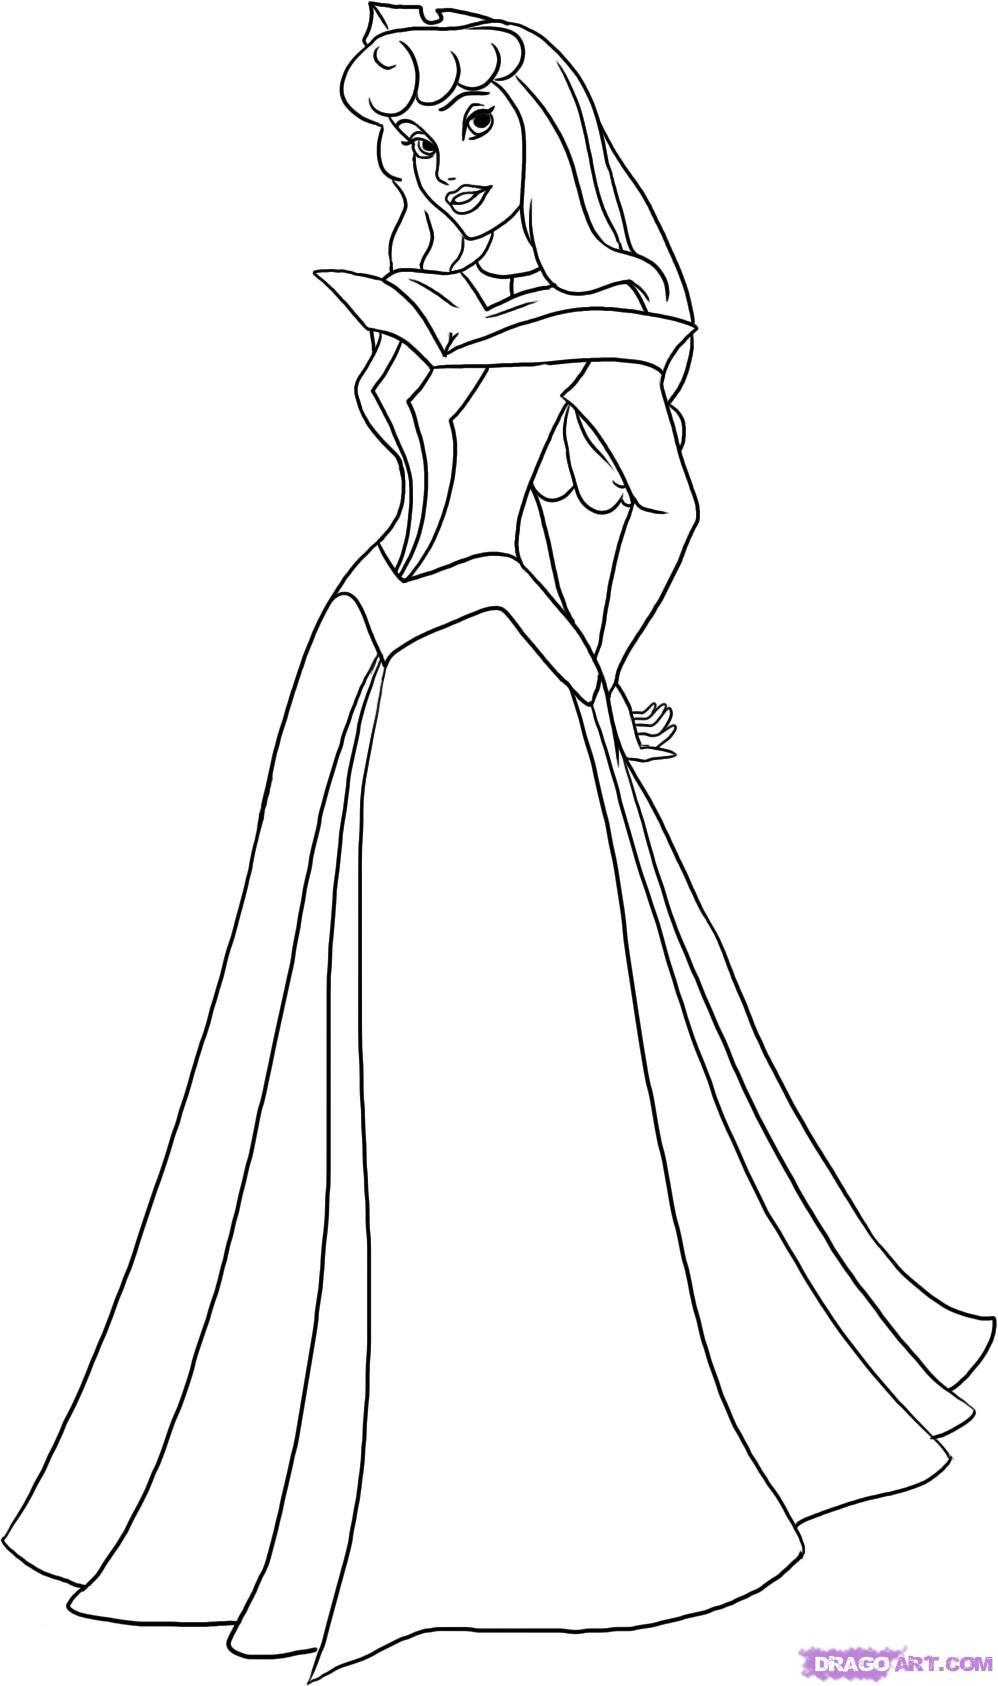 998x1686 Sleeping Beauty Drawing 5. How To Draw Sleeping Beauty, Princess